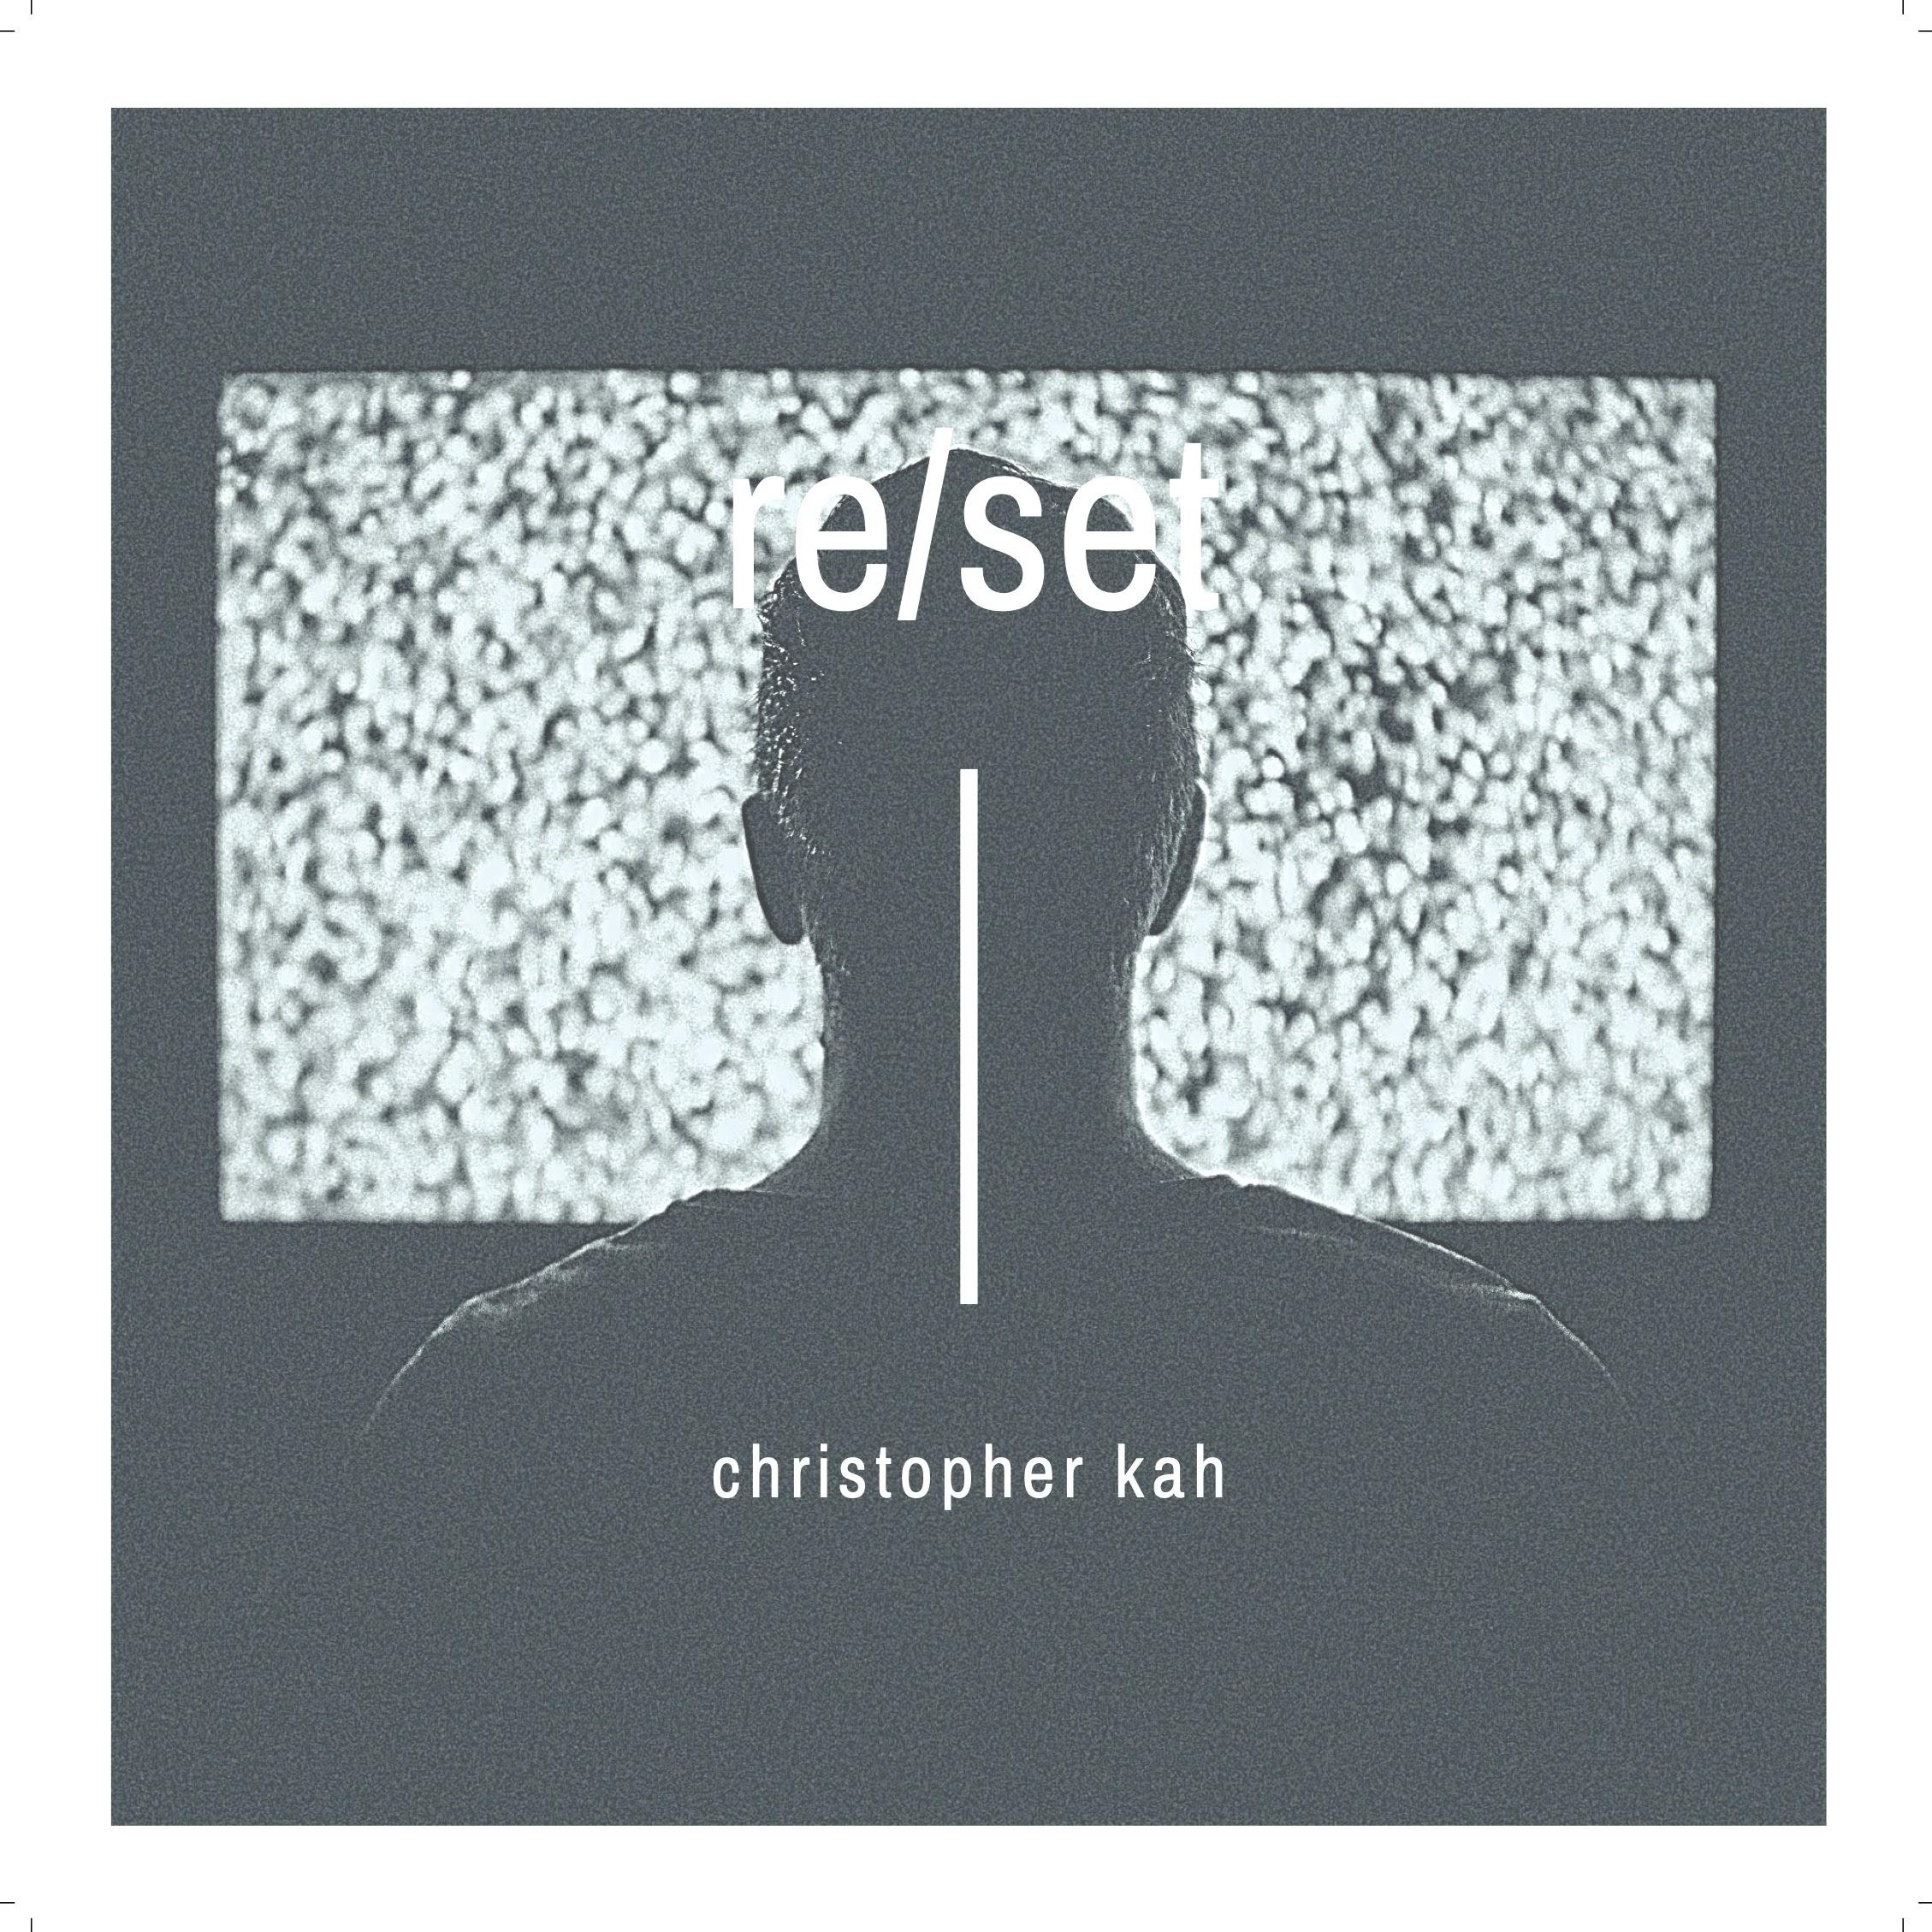 Reset EP Christopher Kah